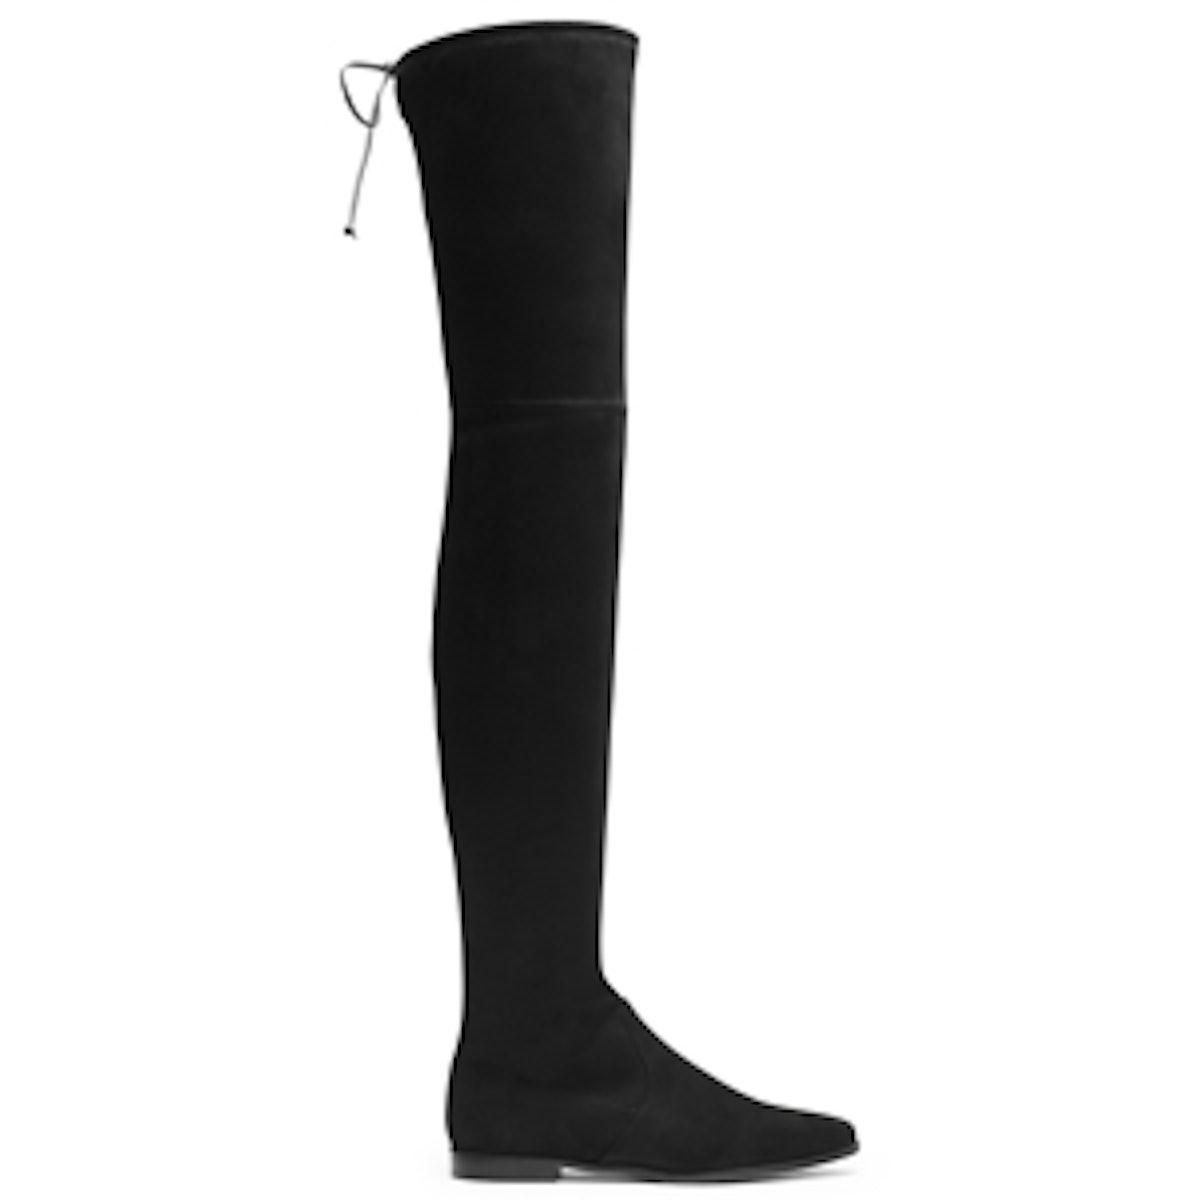 LeggyLady Boot